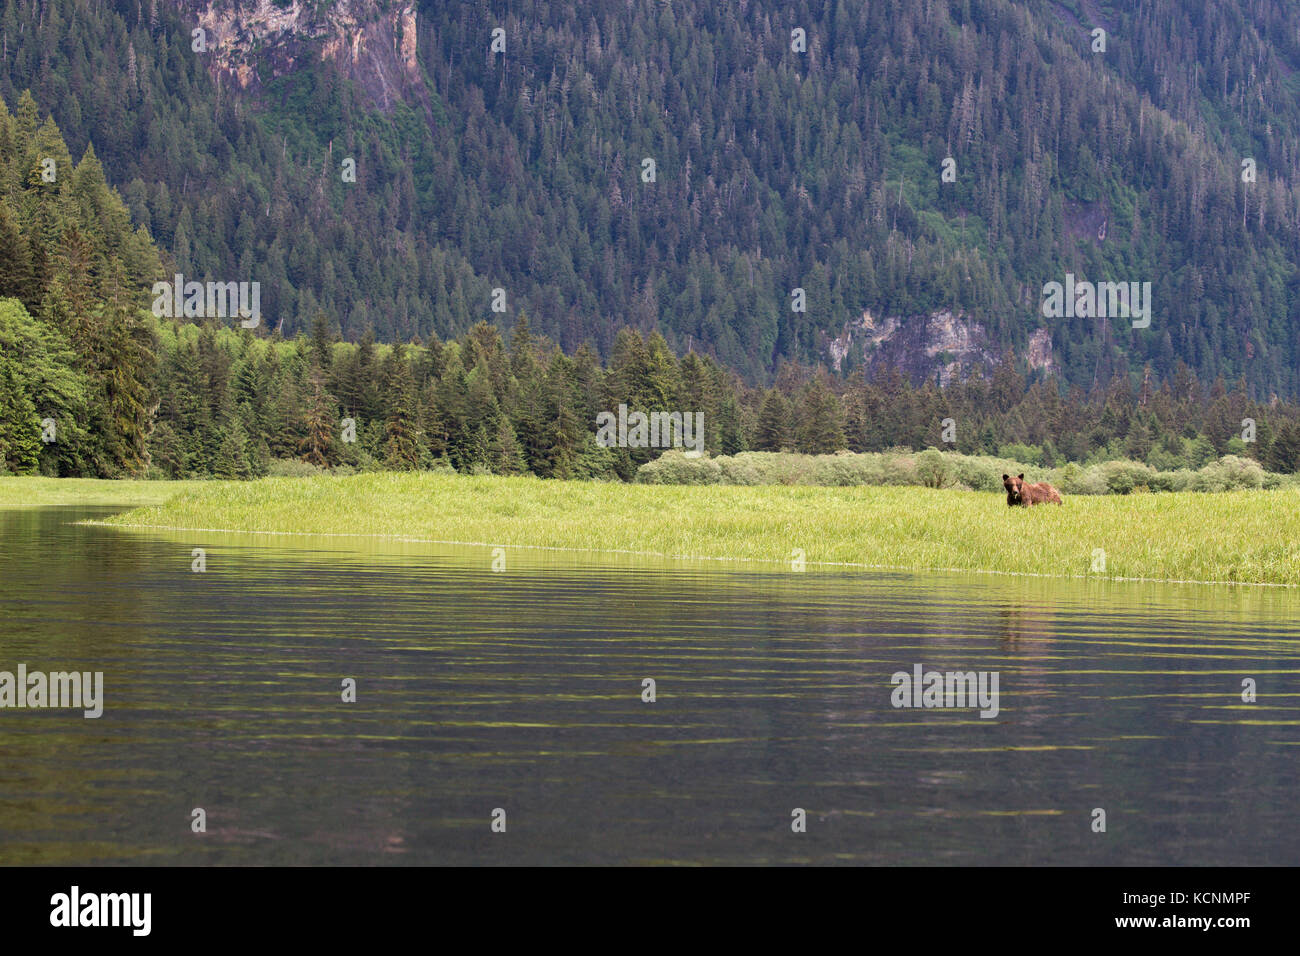 Grizzly bear (Ursus arctos horriblis), eating Lyngbye's sedge (Carex lyngbyei), Khutzeymateen Grizzly Bear Sanctuary, - Stock Image